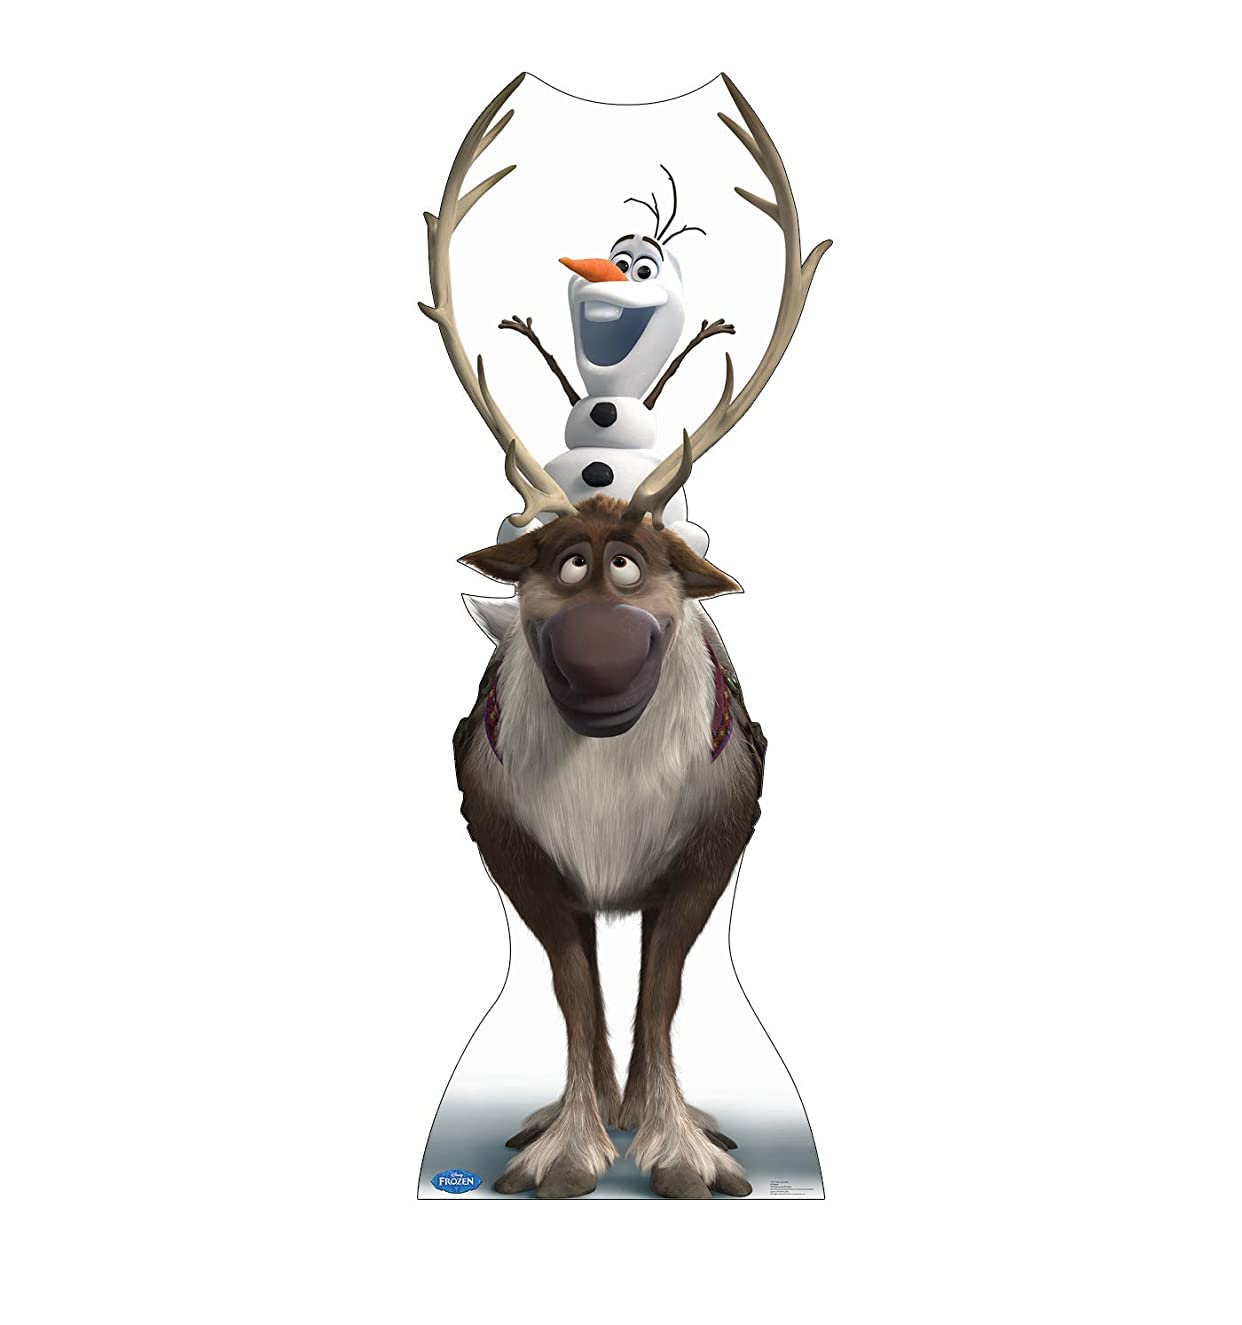 Advanced Graphics Sven & Olaf Life Size Cardboard Cutout Standup - Disney's Frozen (2013 Film)